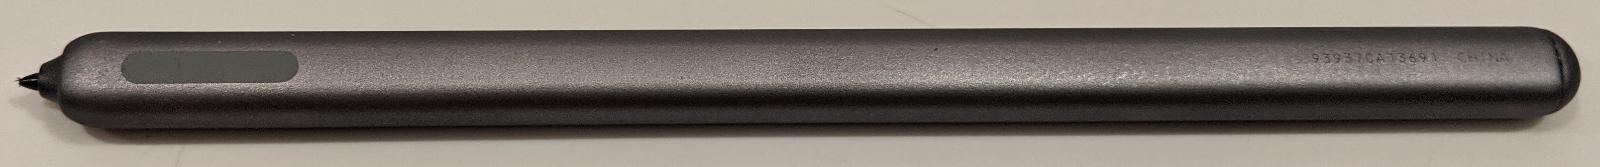 Samsung EJ-PT860BJ S pen Galaxy Tab S6